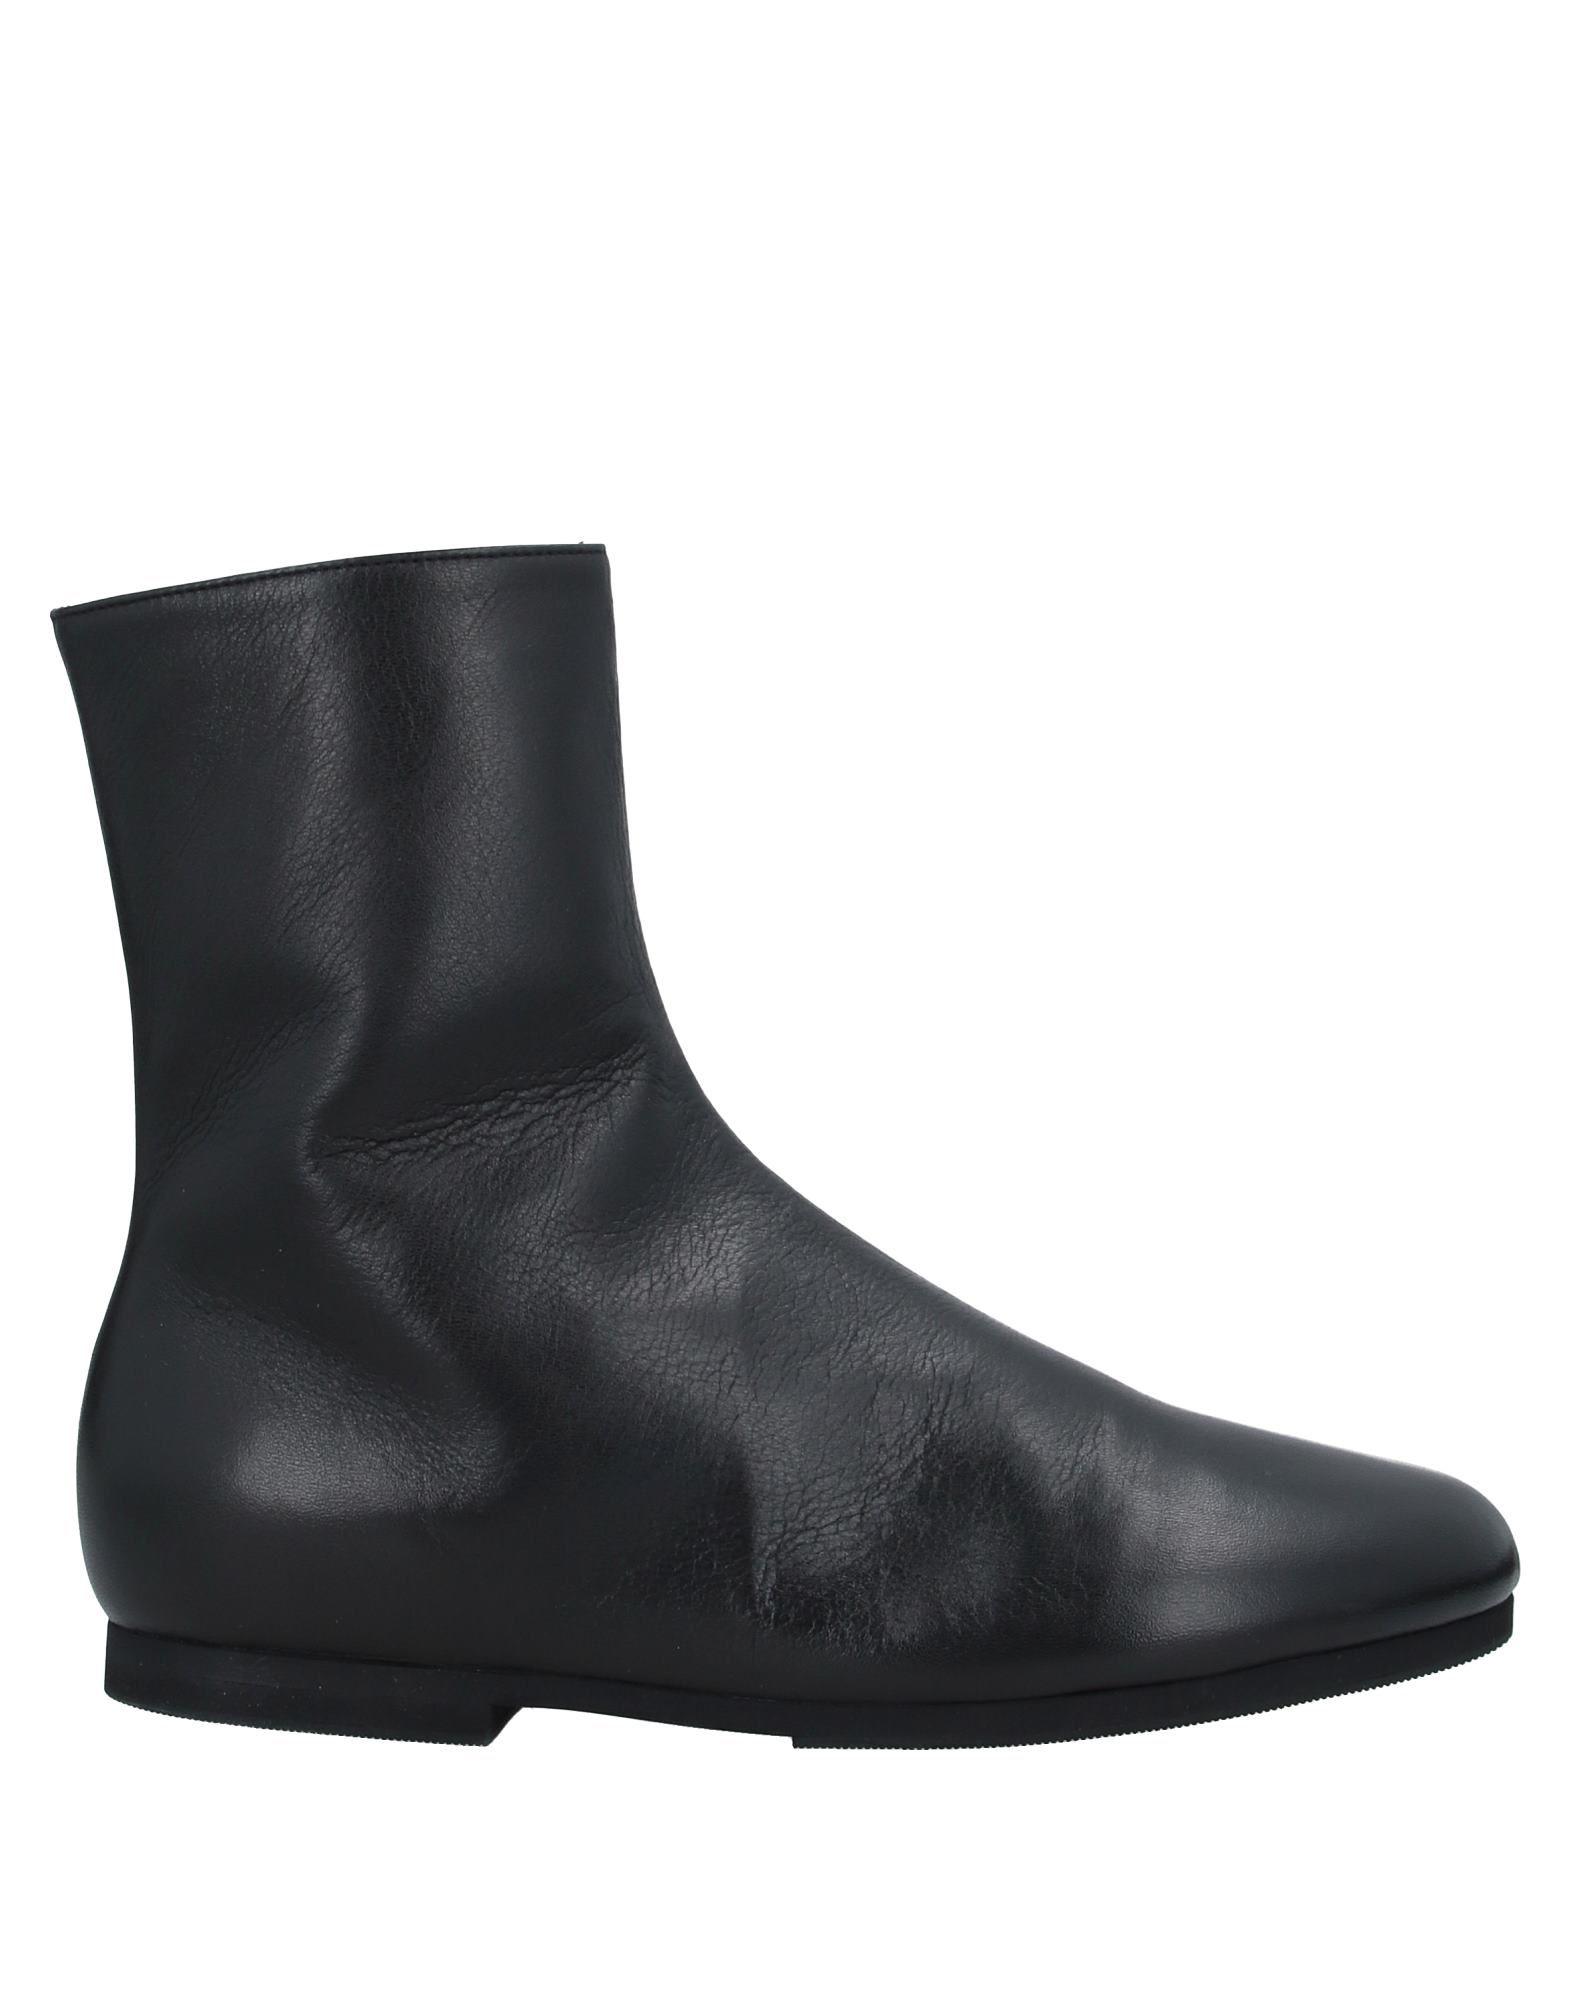 WANNA MARIA FIORI Полусапоги и высокие ботинки ботинки fiori